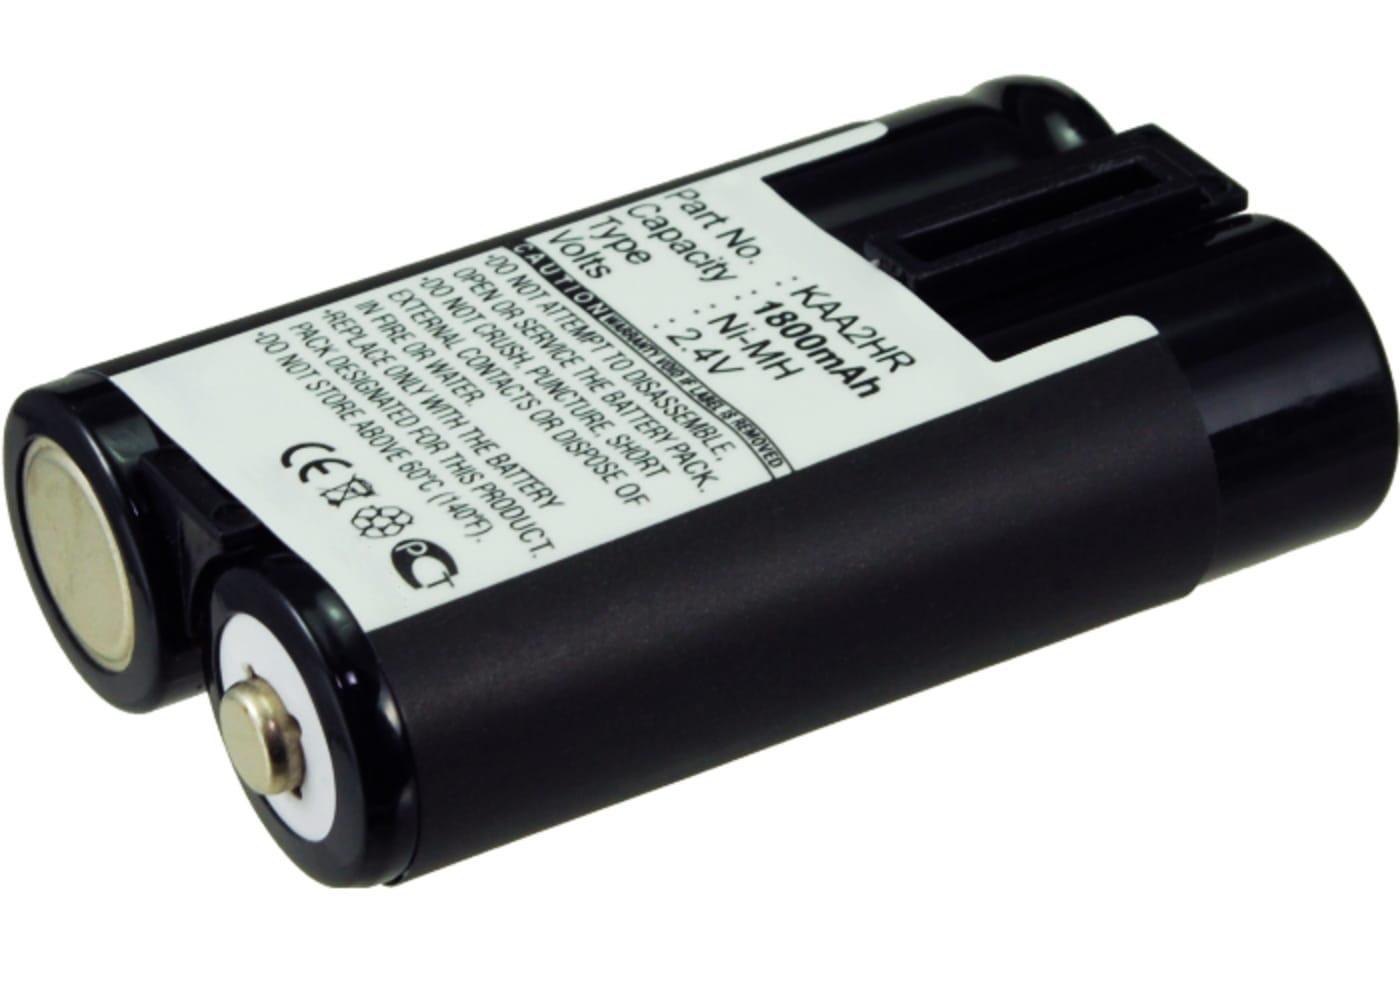 Akku für Kodak Easyshare Z650 Z710 Z740, C613 C713 C813, ZD710, Fuji FinePix S5000 (1800mAh) NH-10